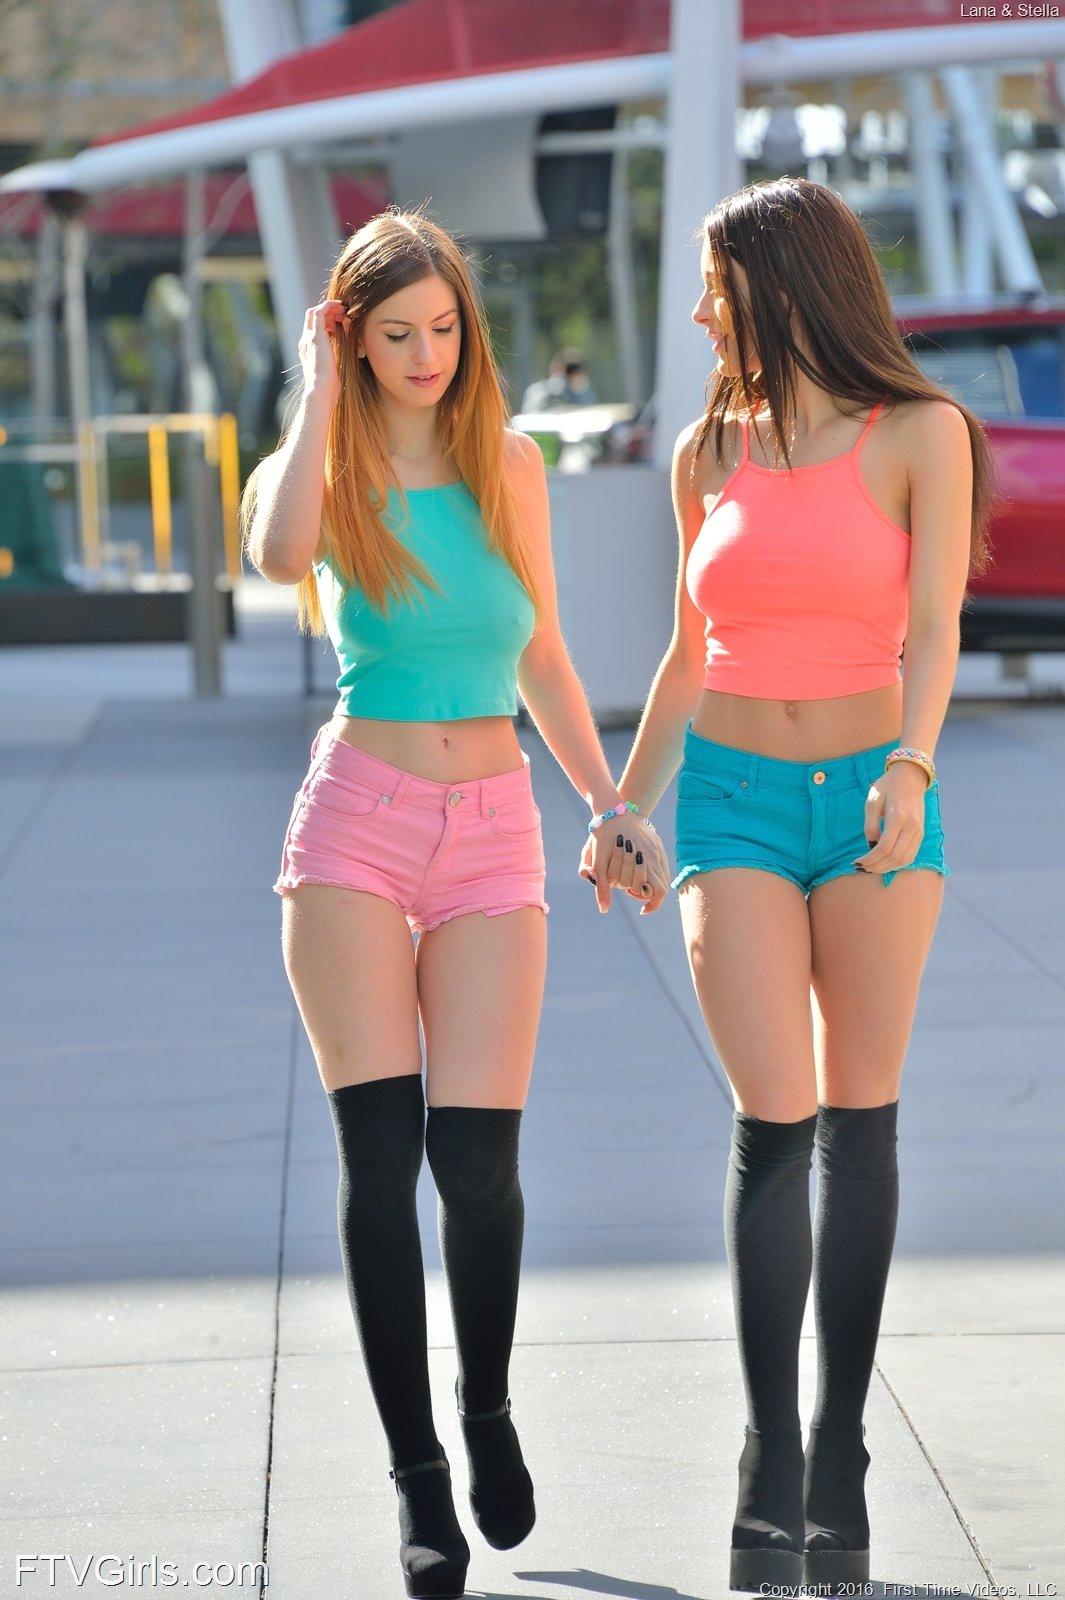 lana-stella-public-lesbian-shorts-nude-ftvgirls-04